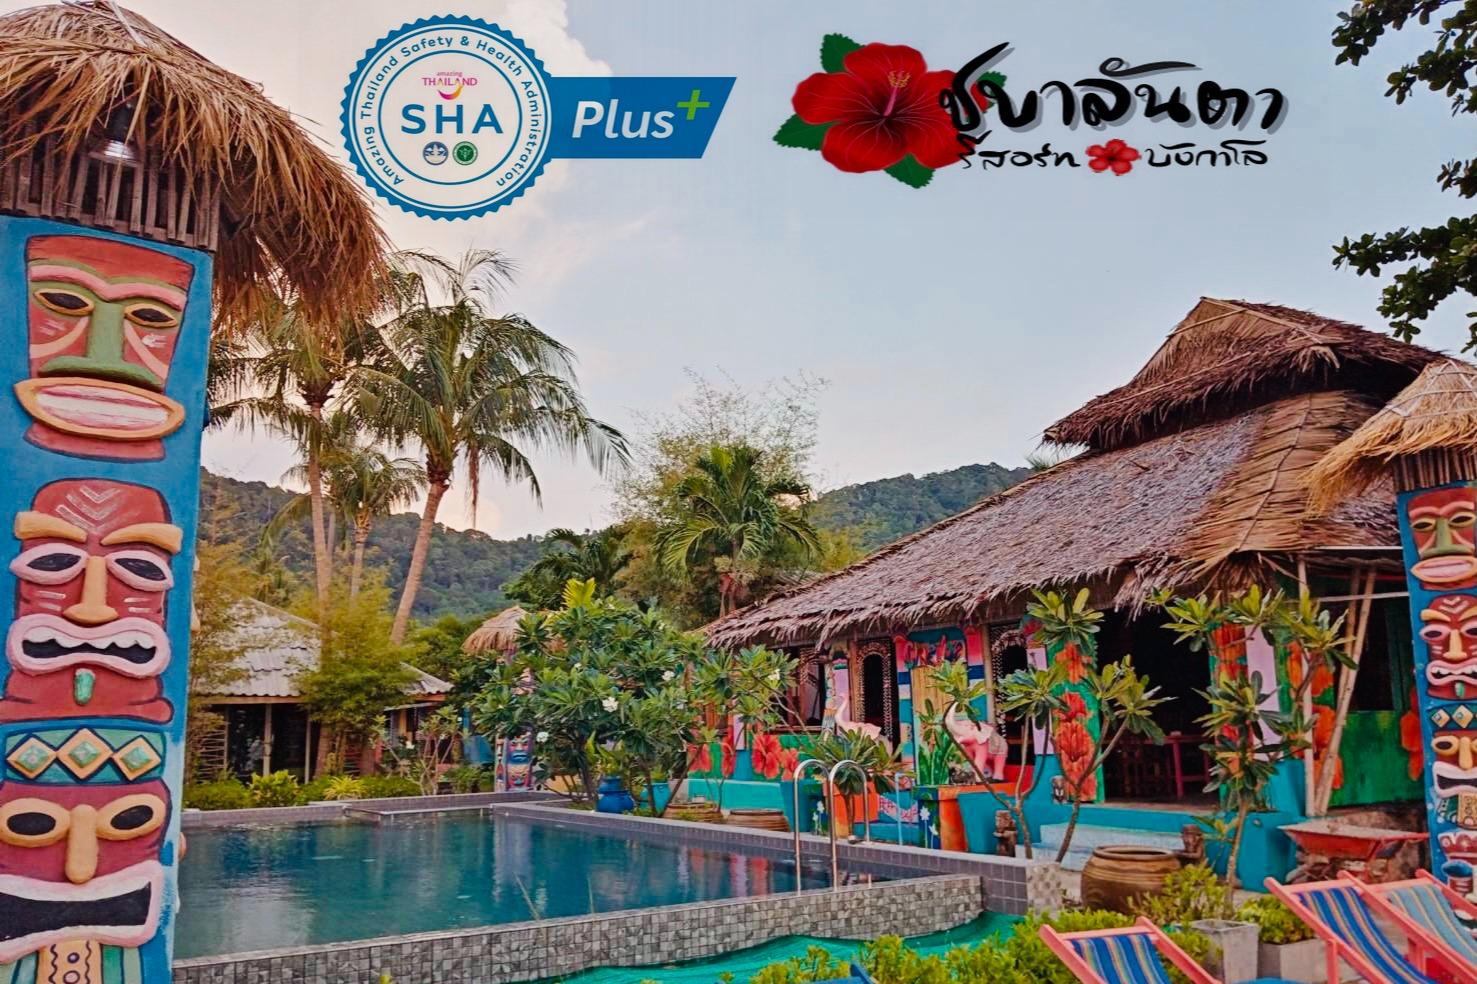 Cha-Ba Lanta Resort & Bungalow - Image 1